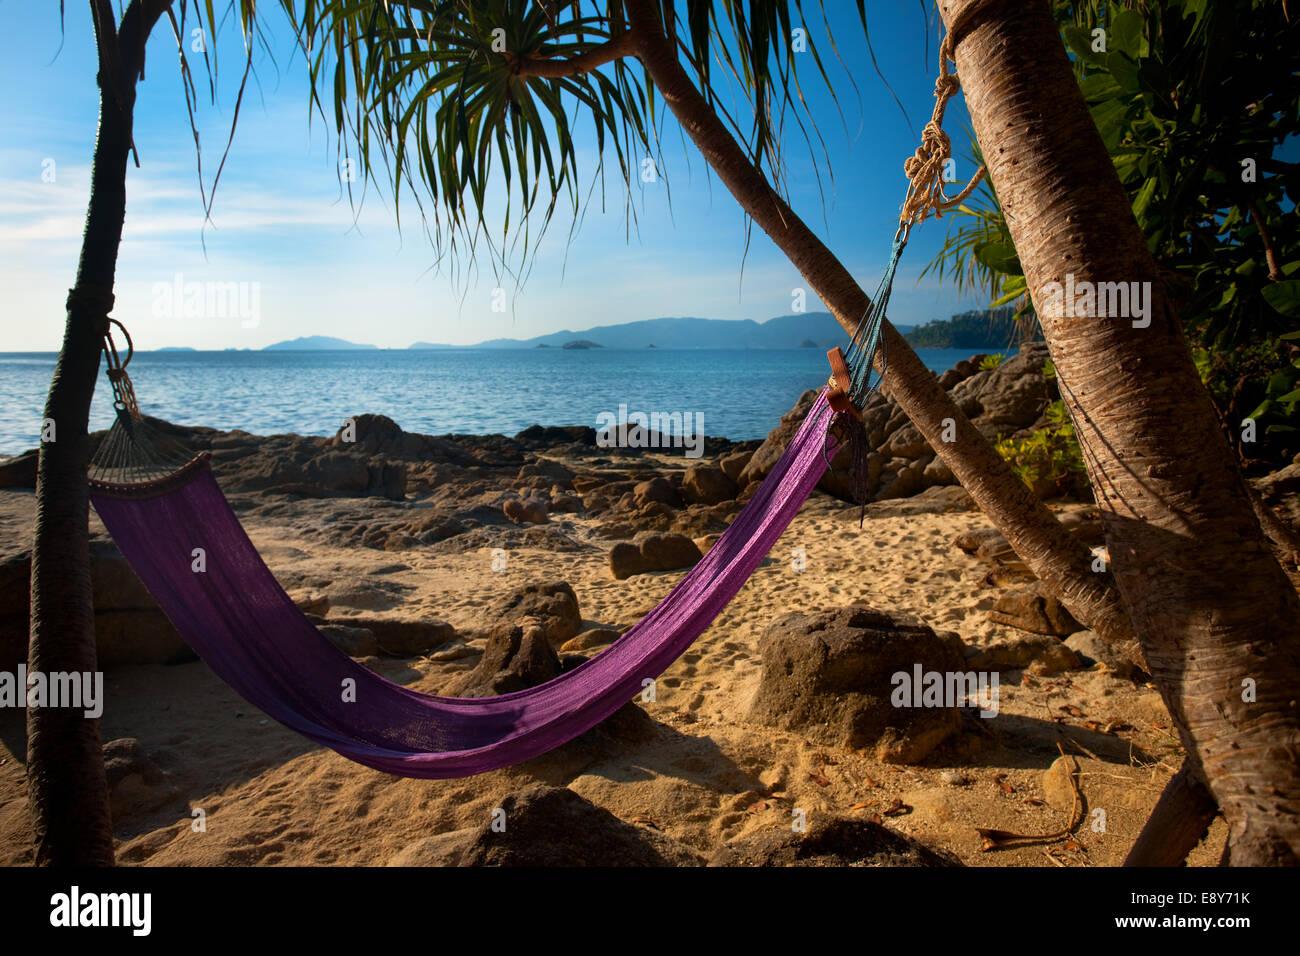 Beachfront Hammock Stock Photos Amp Beachfront Hammock Stock